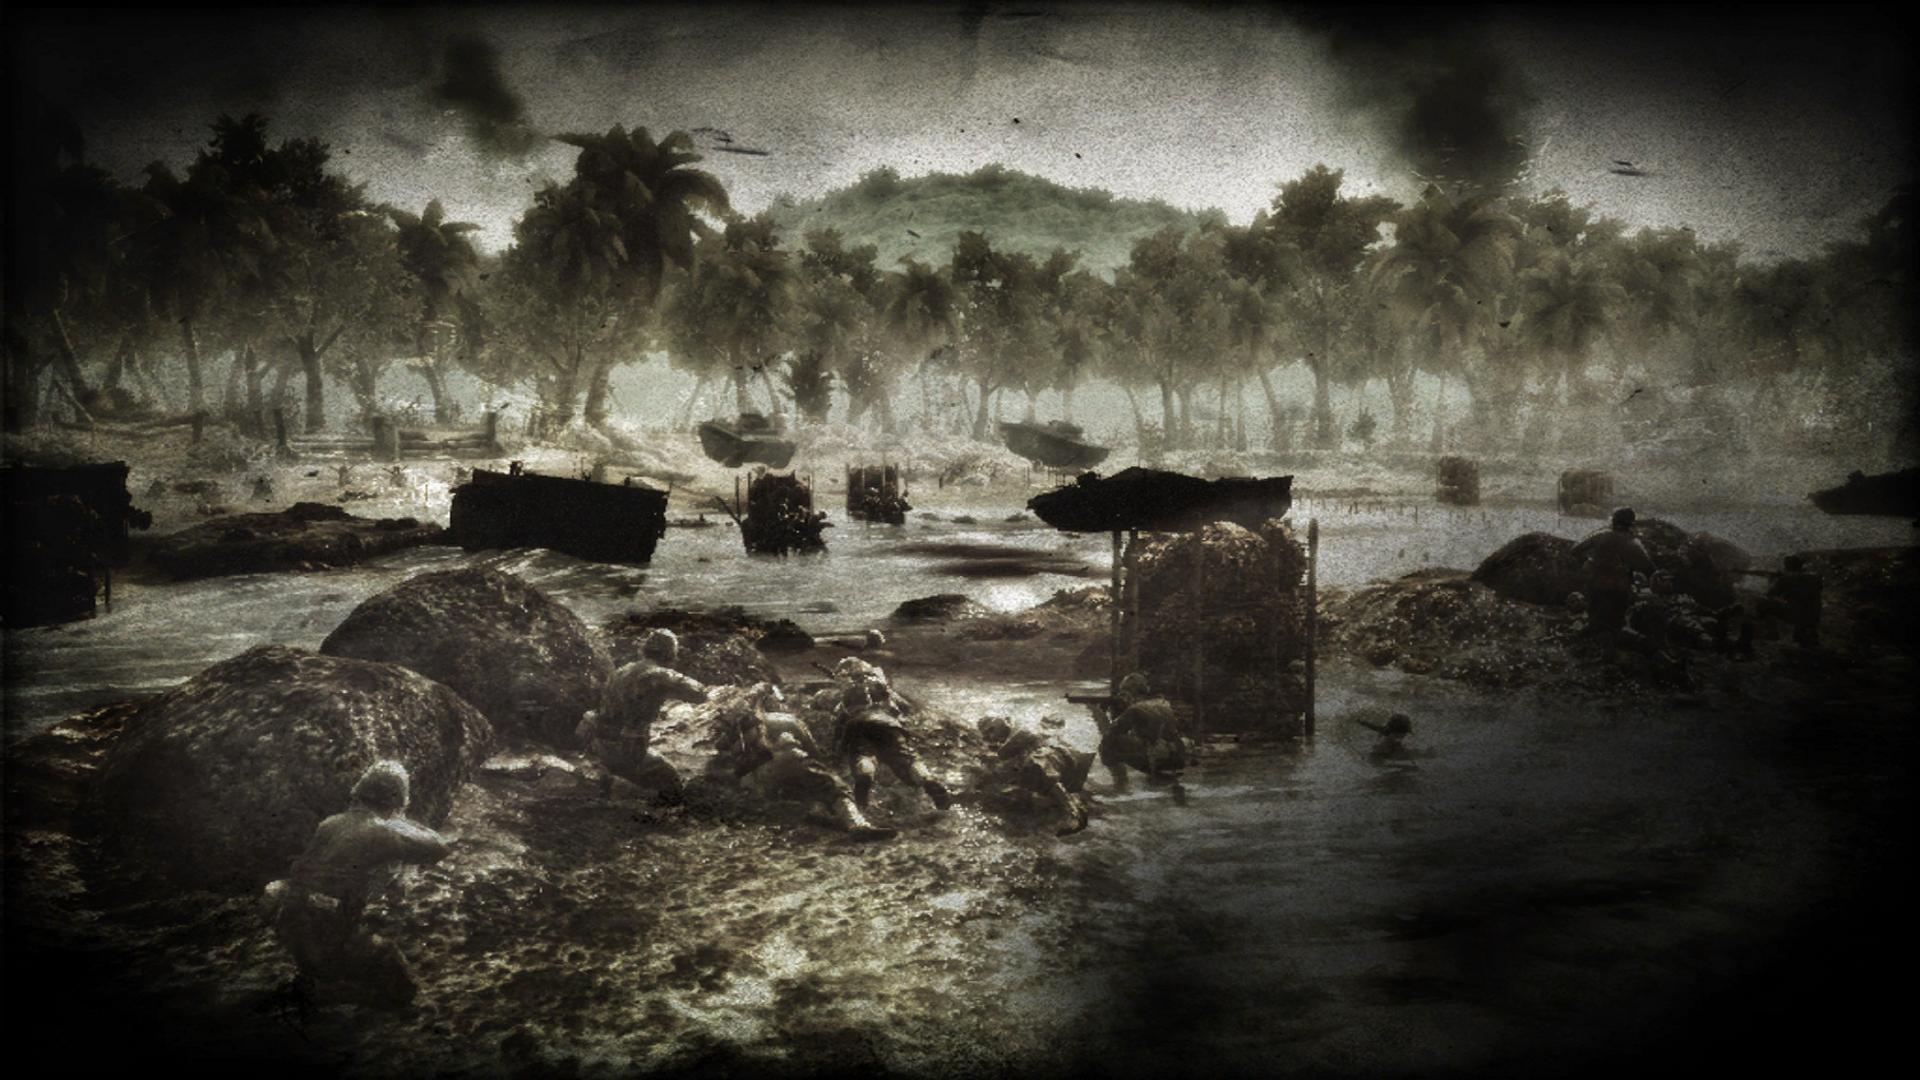 Veteran (difficulty) | Call of Duty Wiki | FANDOM powered by Wikia